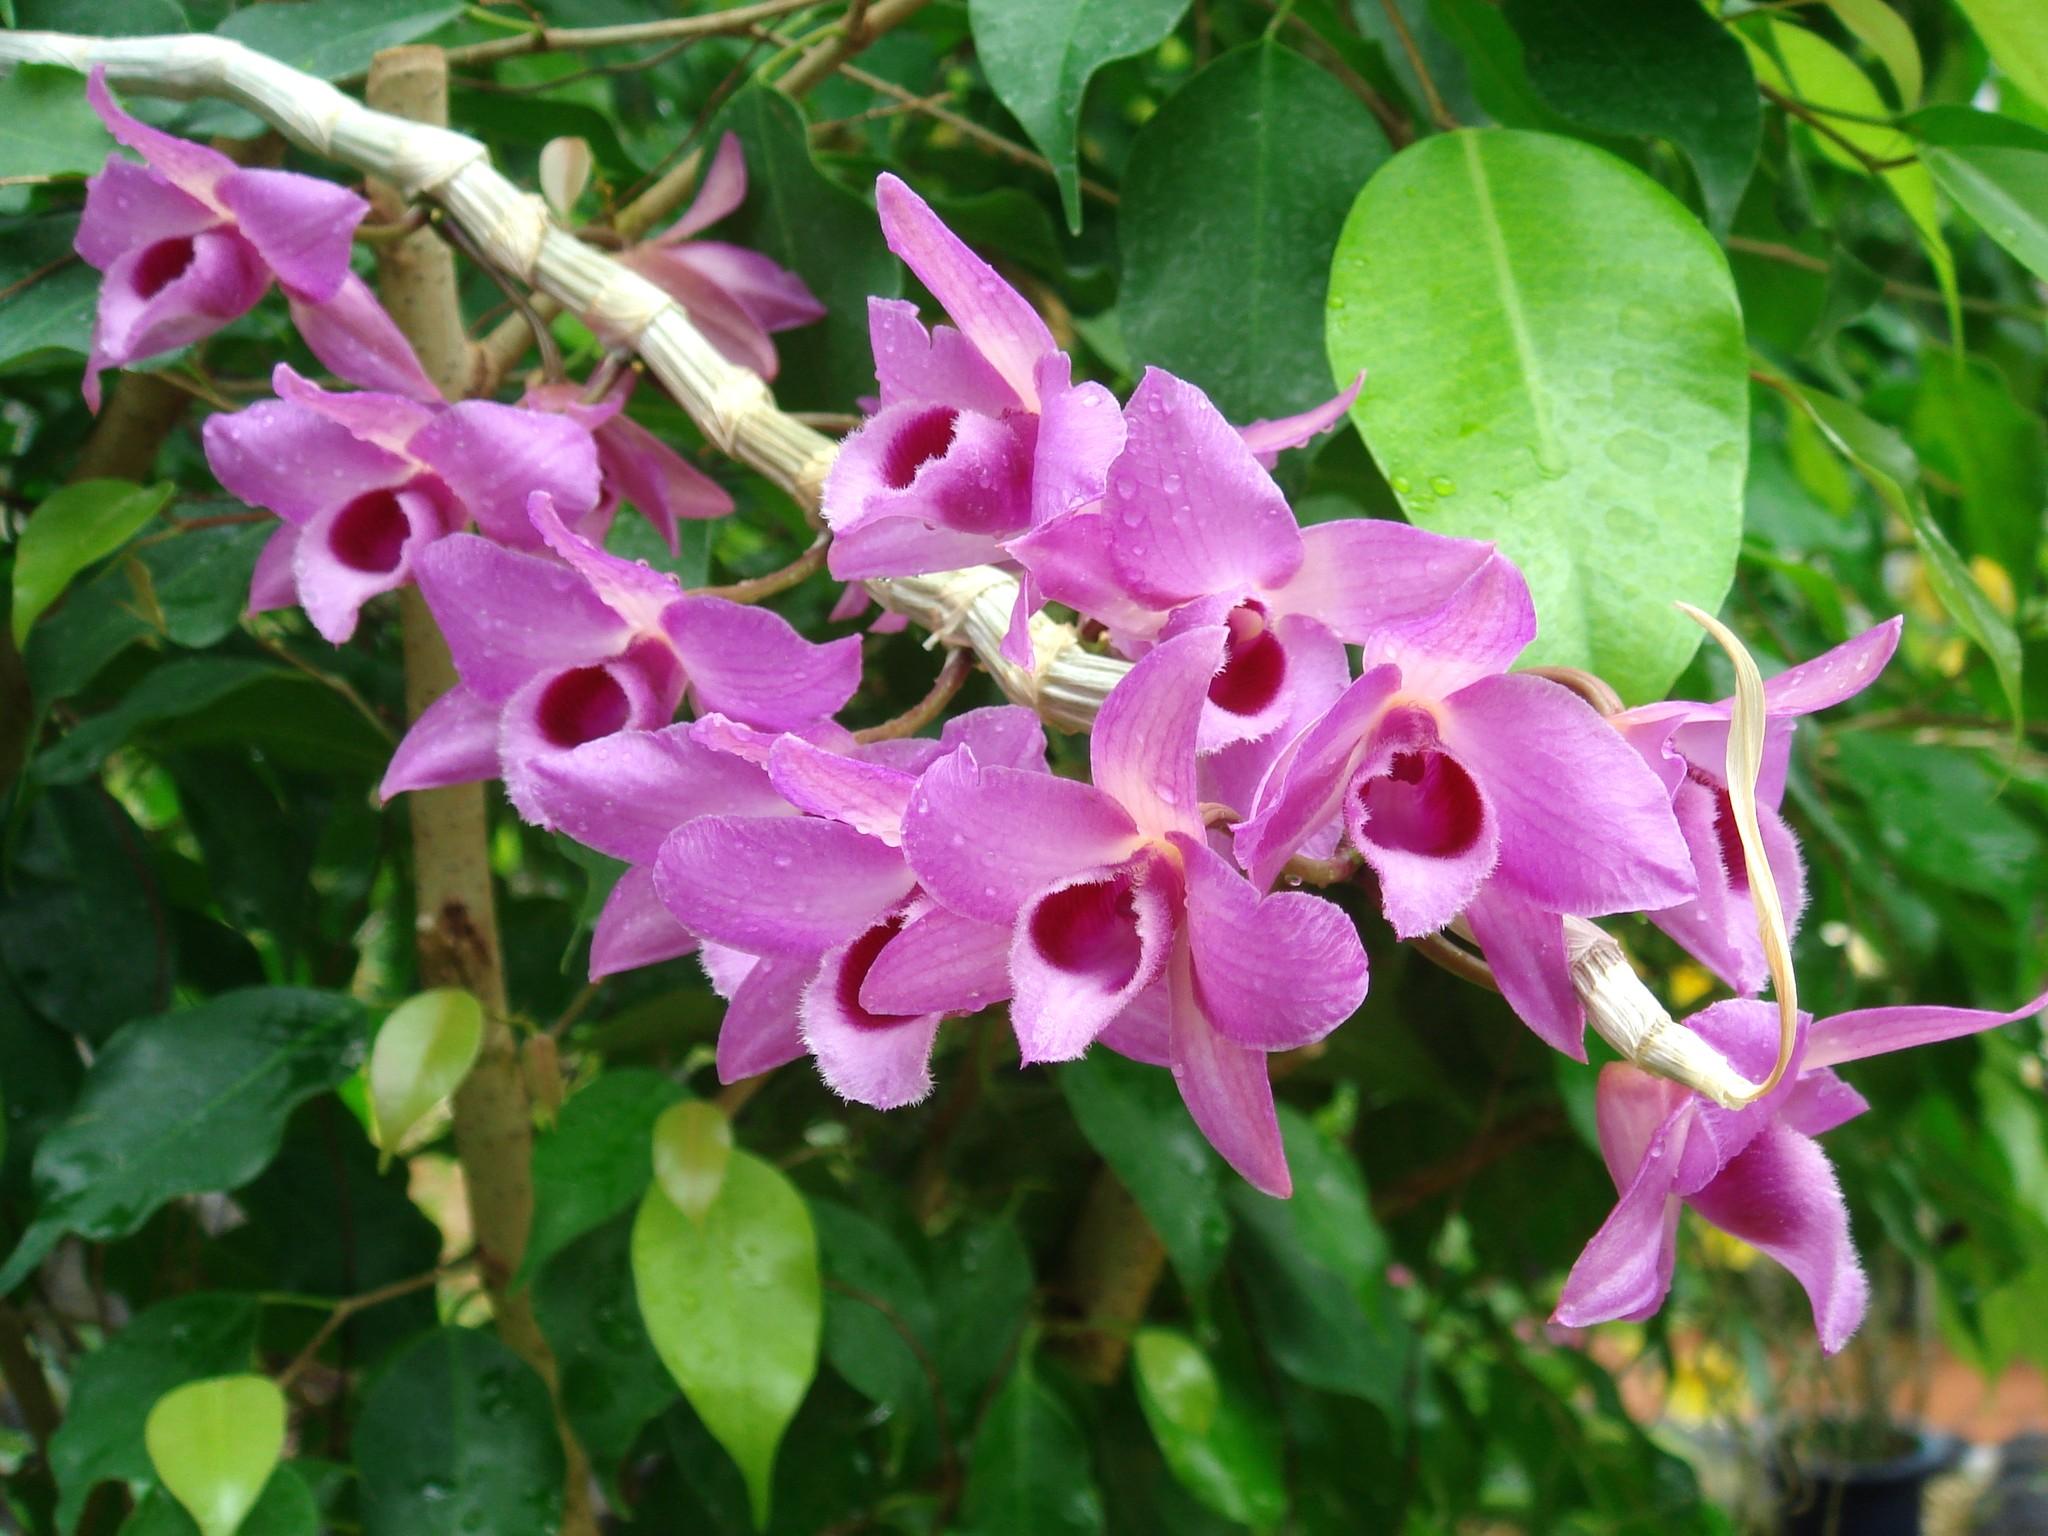 http://orchids.la.coocan.jp/Dendrobium/Dendrobium%20parishii/DSC07090.JPG